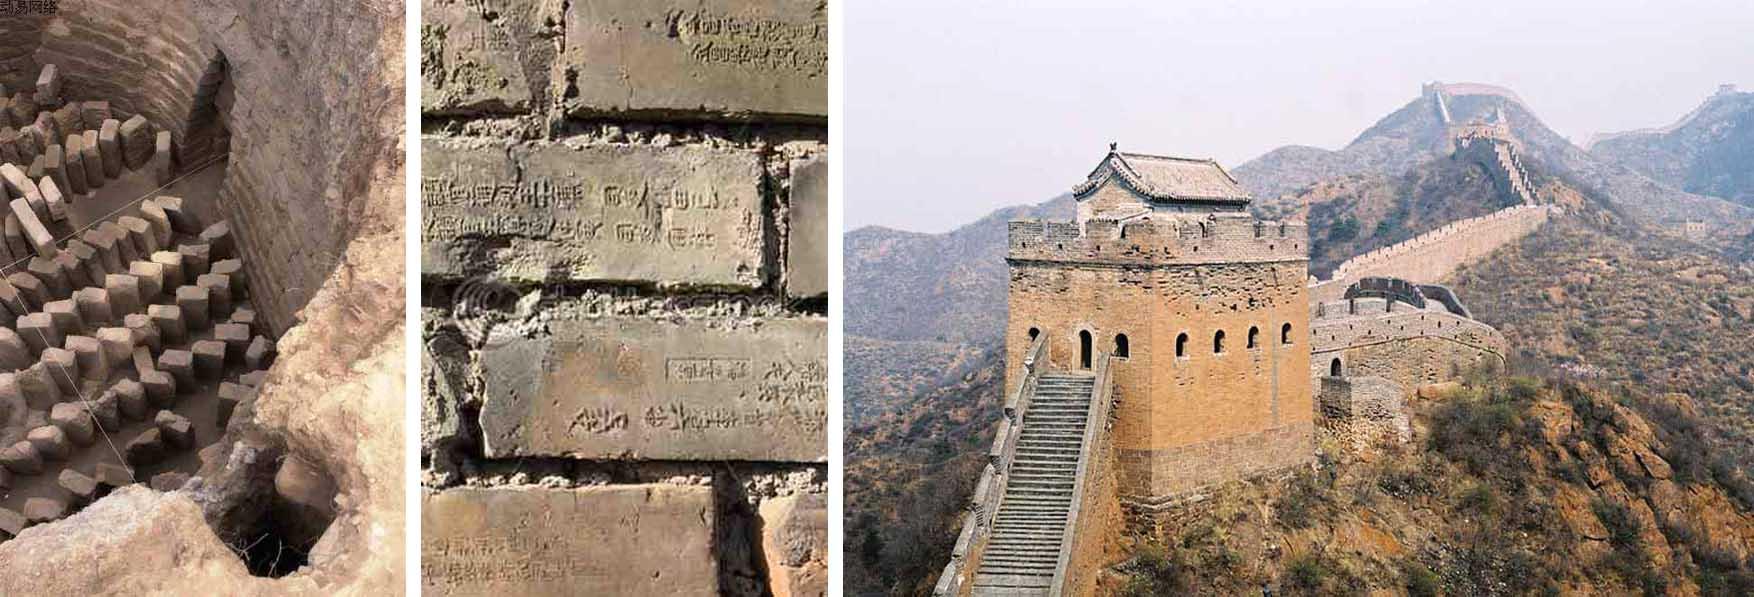 13 kineski zid